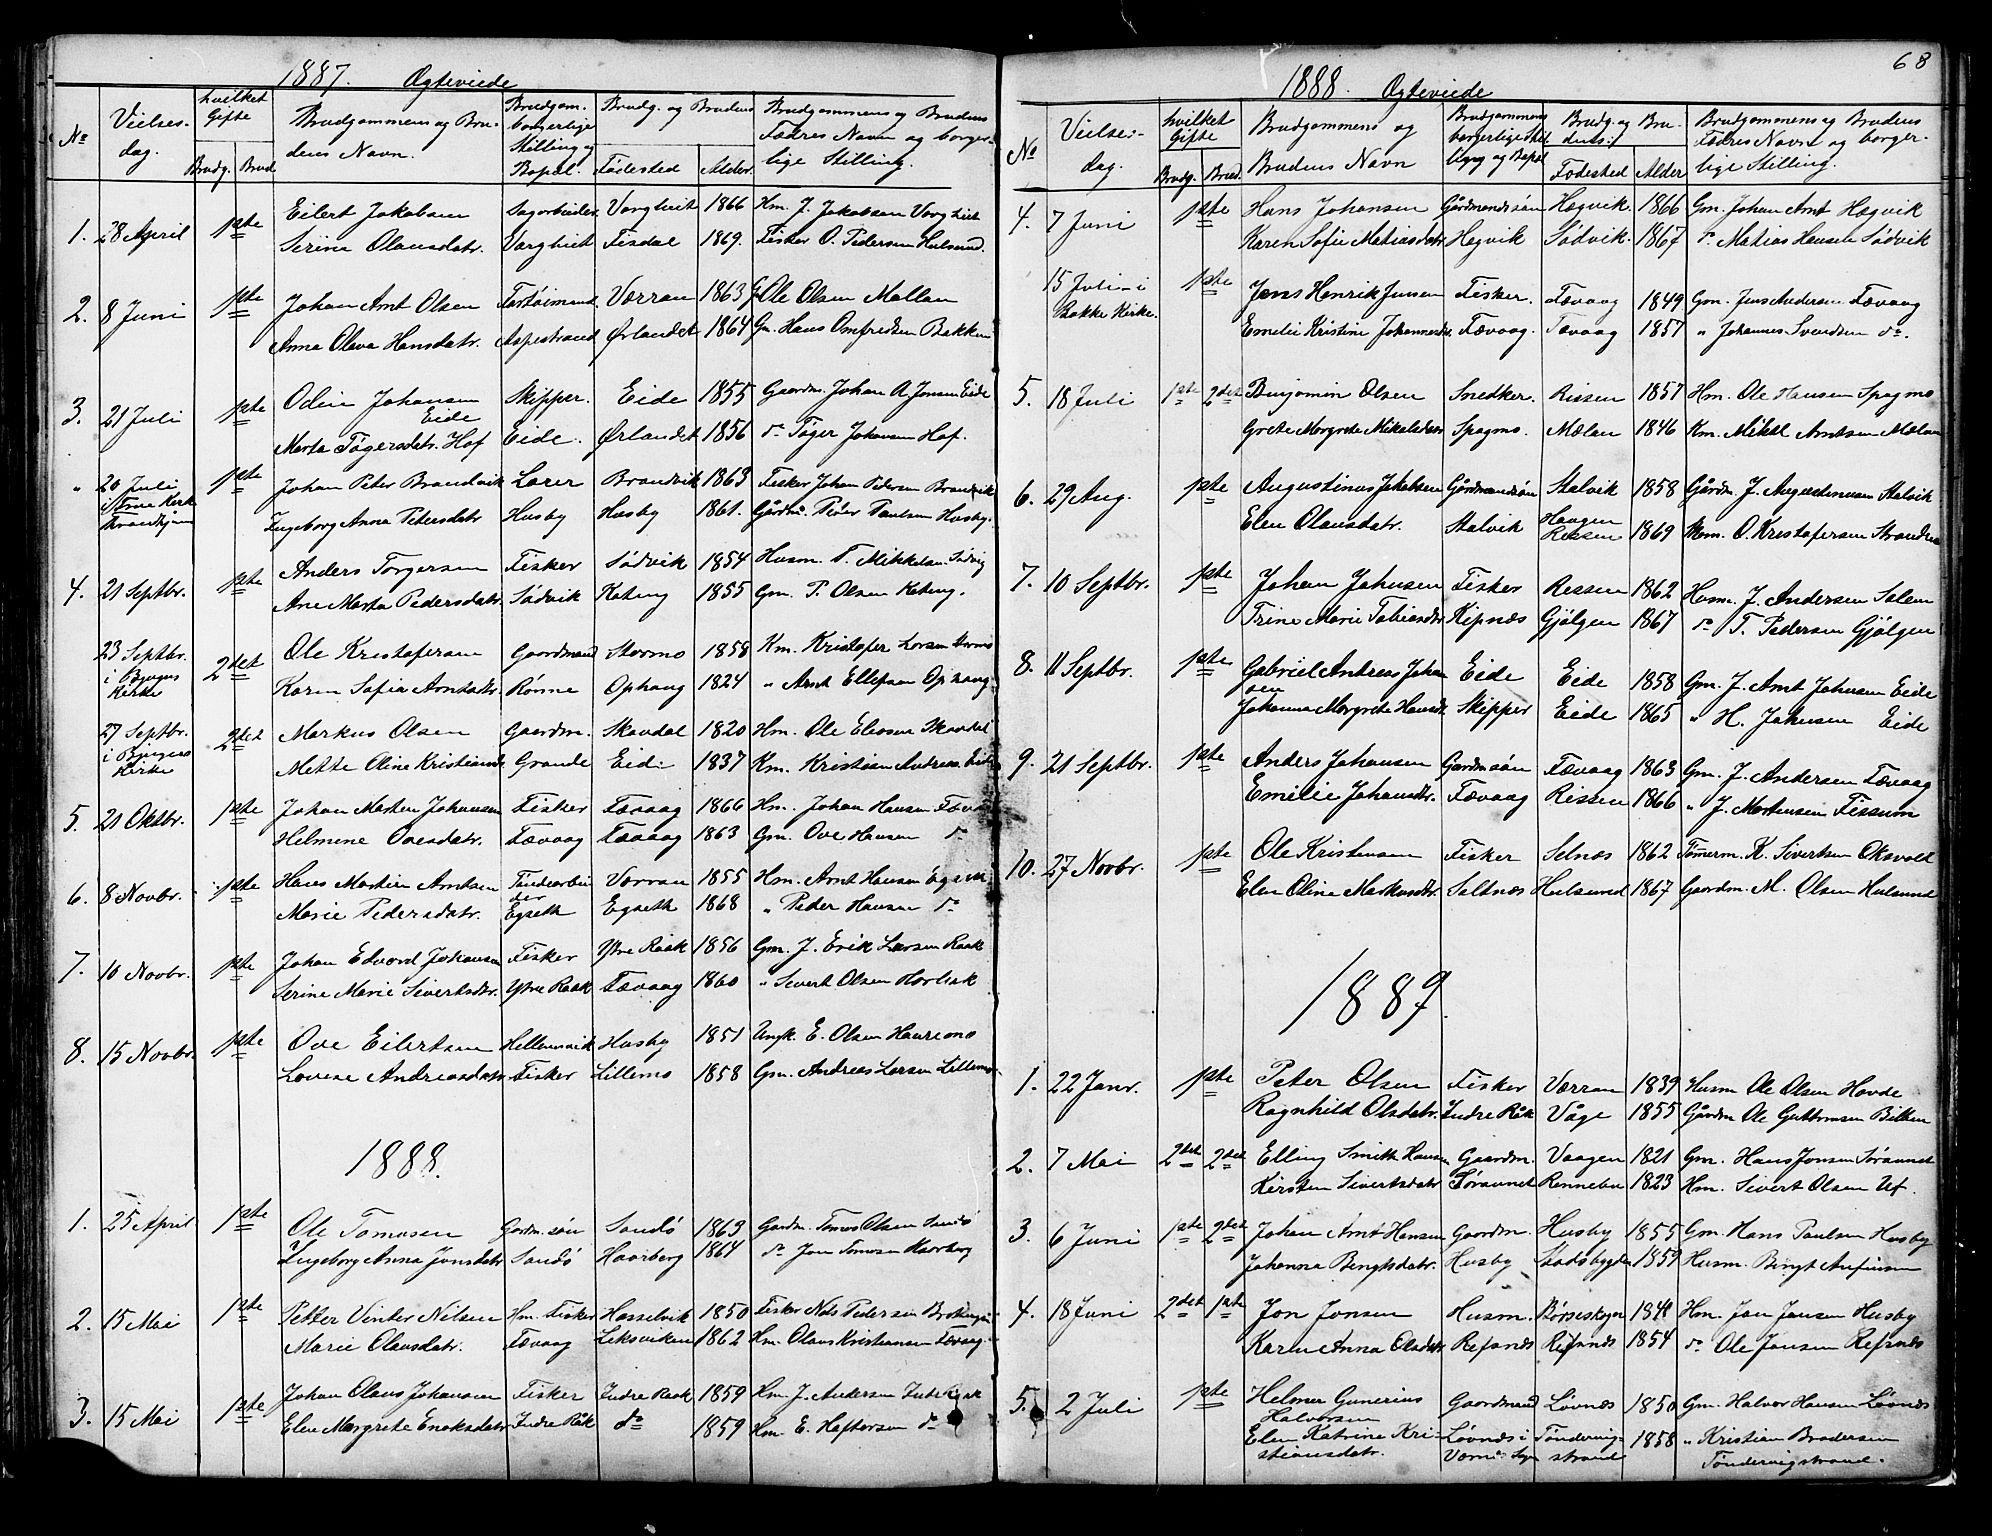 SAT, Ministerialprotokoller, klokkerbøker og fødselsregistre - Sør-Trøndelag, 653/L0657: Parish register (copy) no. 653C01, 1866-1893, p. 68